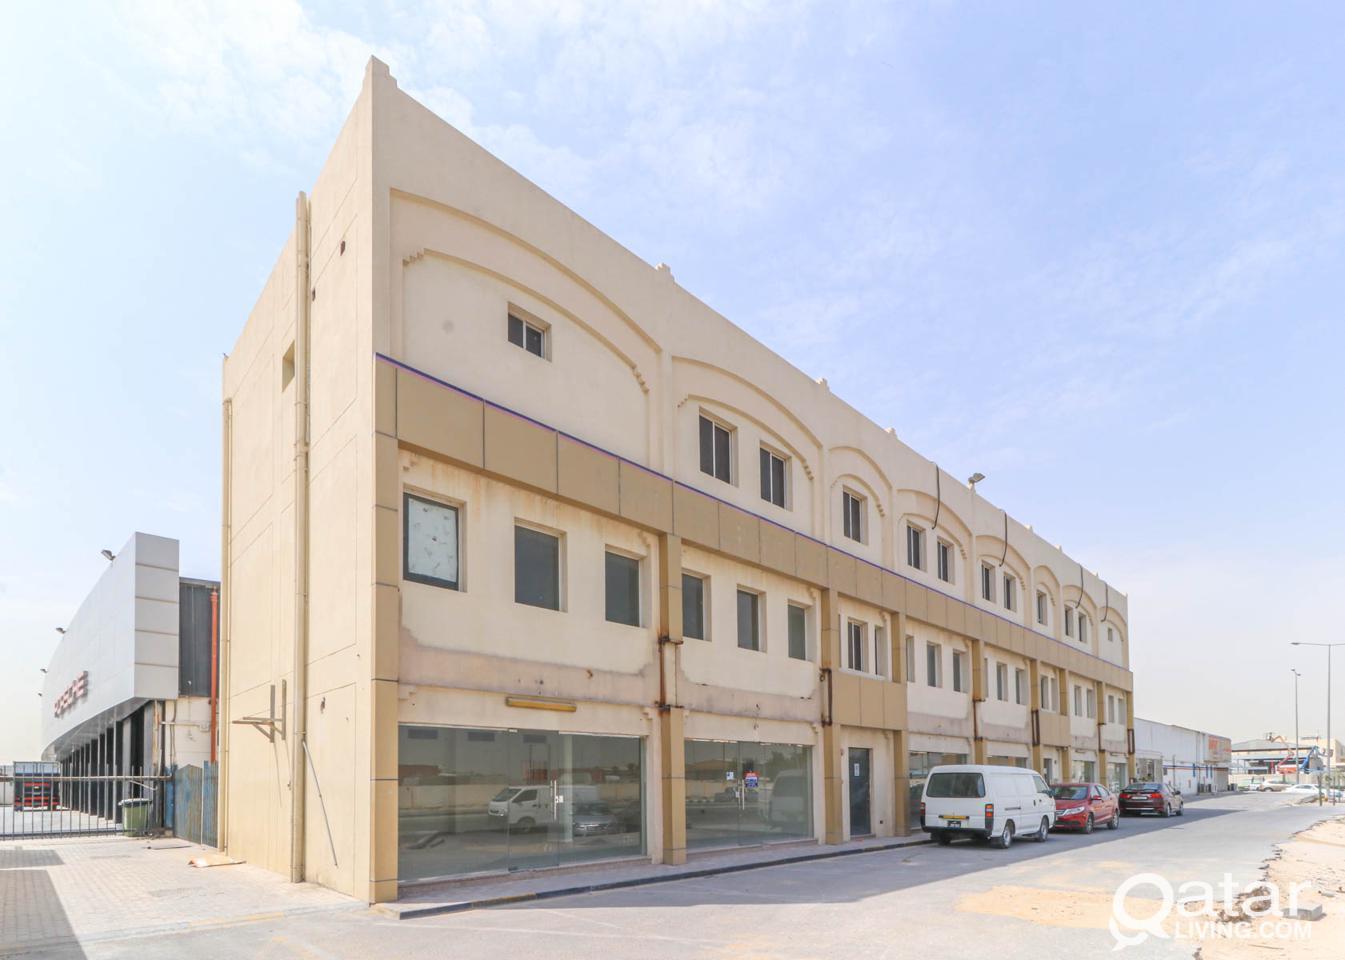 Custom Built Retail Shop with Mezzanine Level